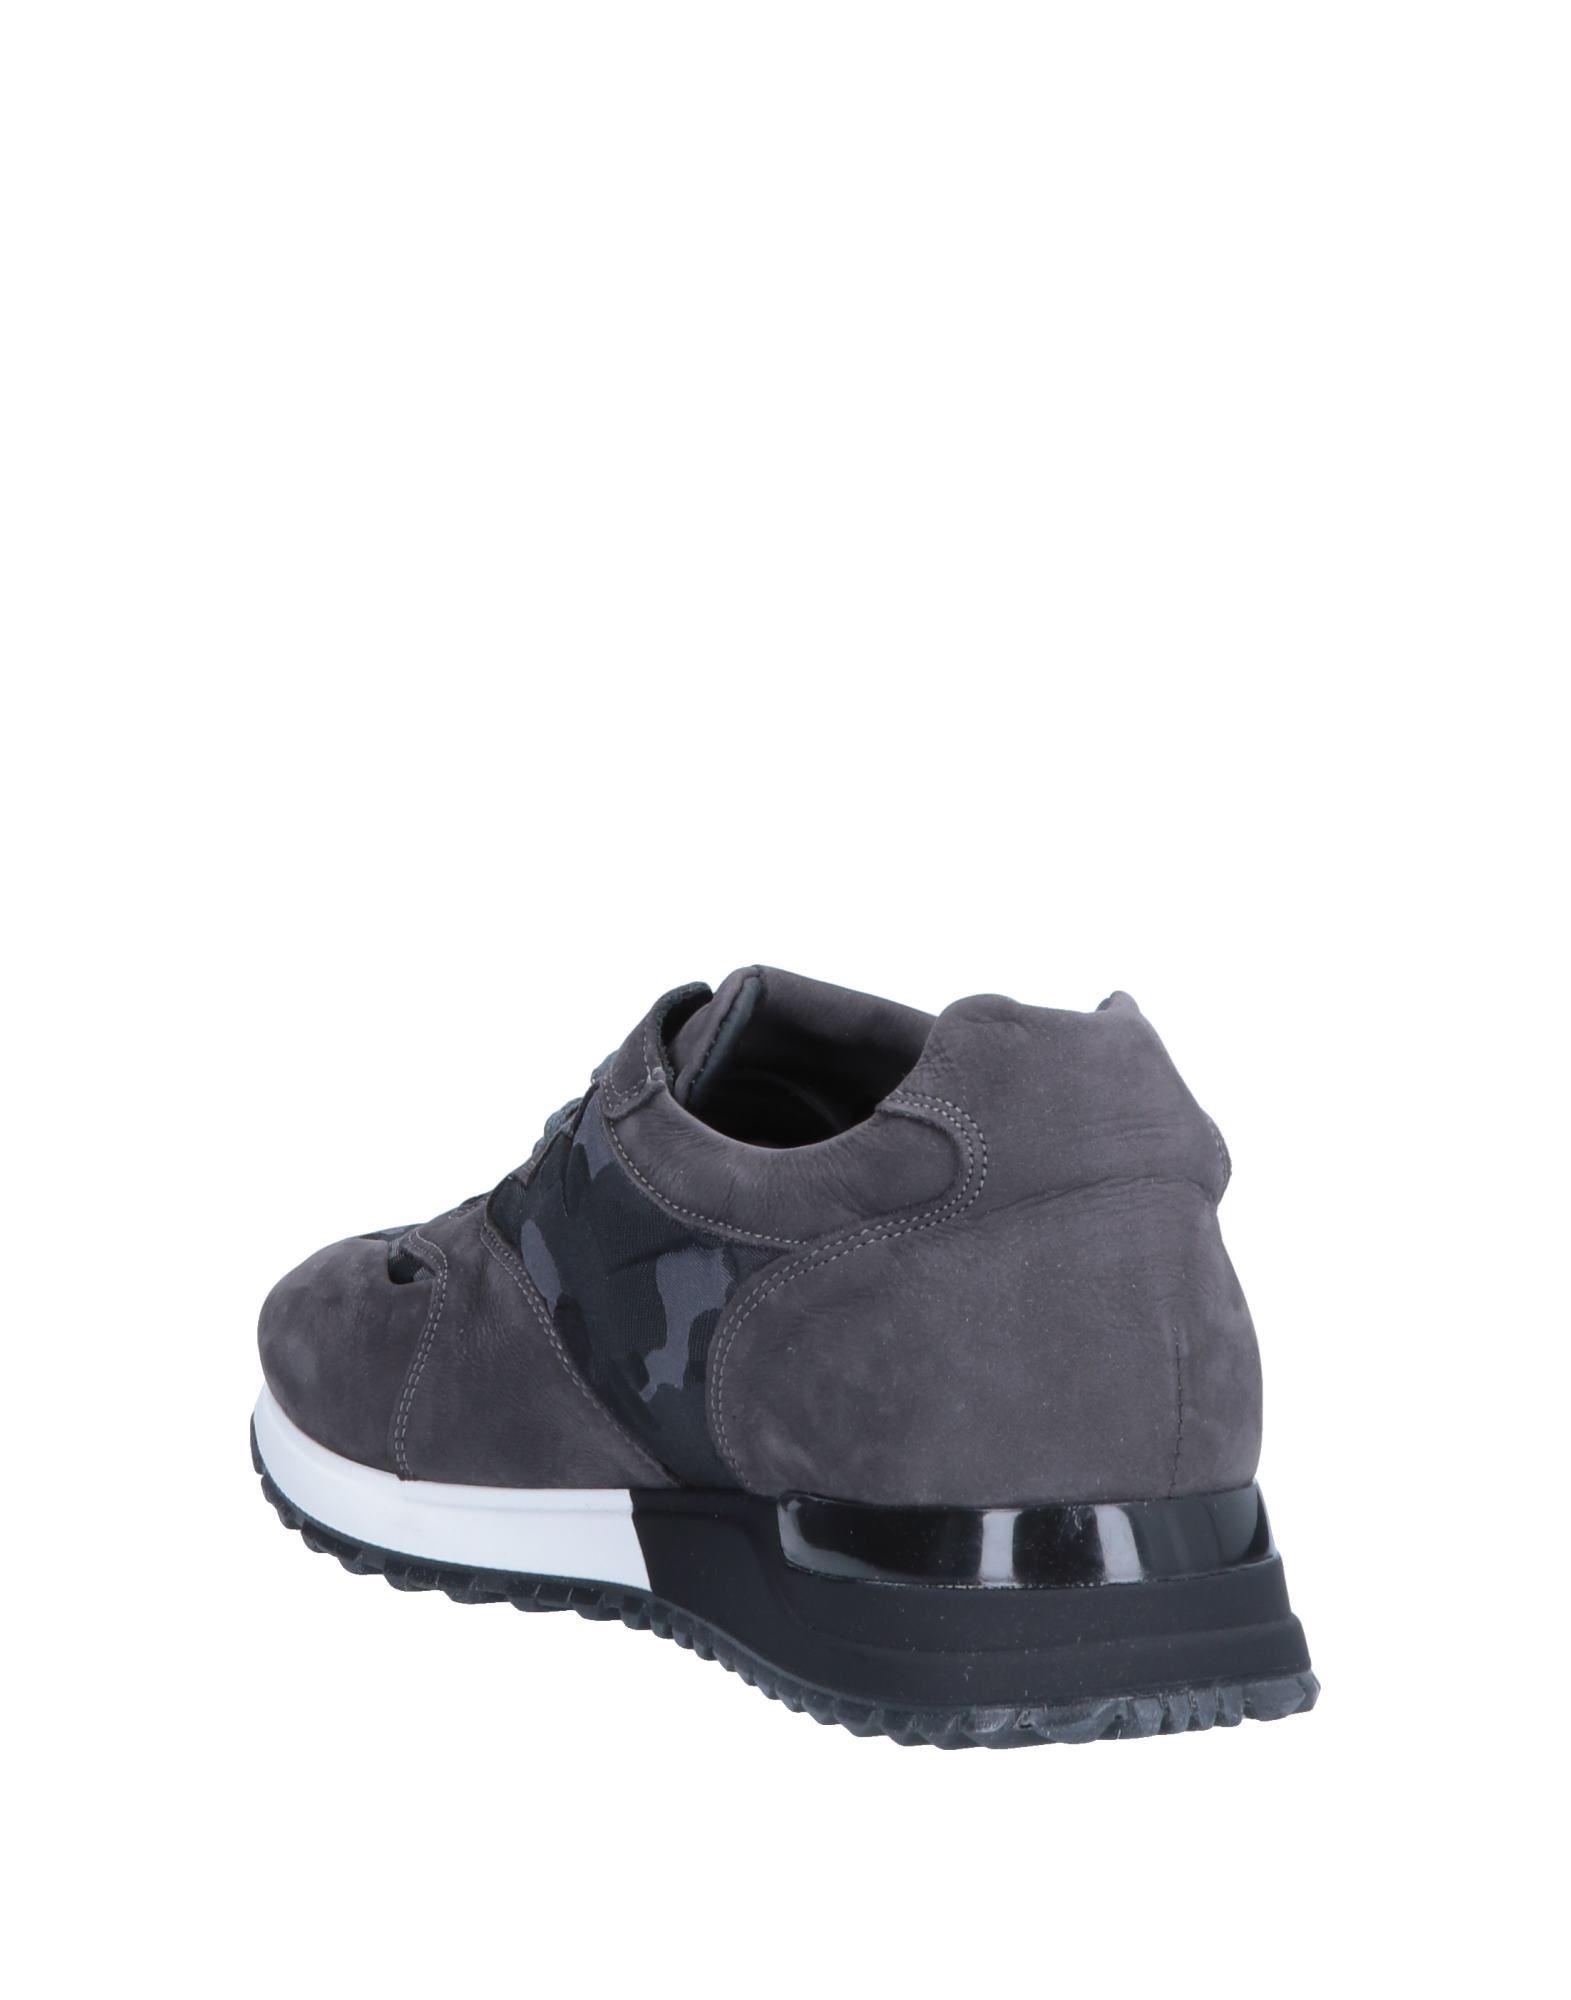 Andrea Morelli Sneakers - Men Andrea Morelli Sneakers Sneakers Sneakers online on  Canada - 11560241LO e355ae